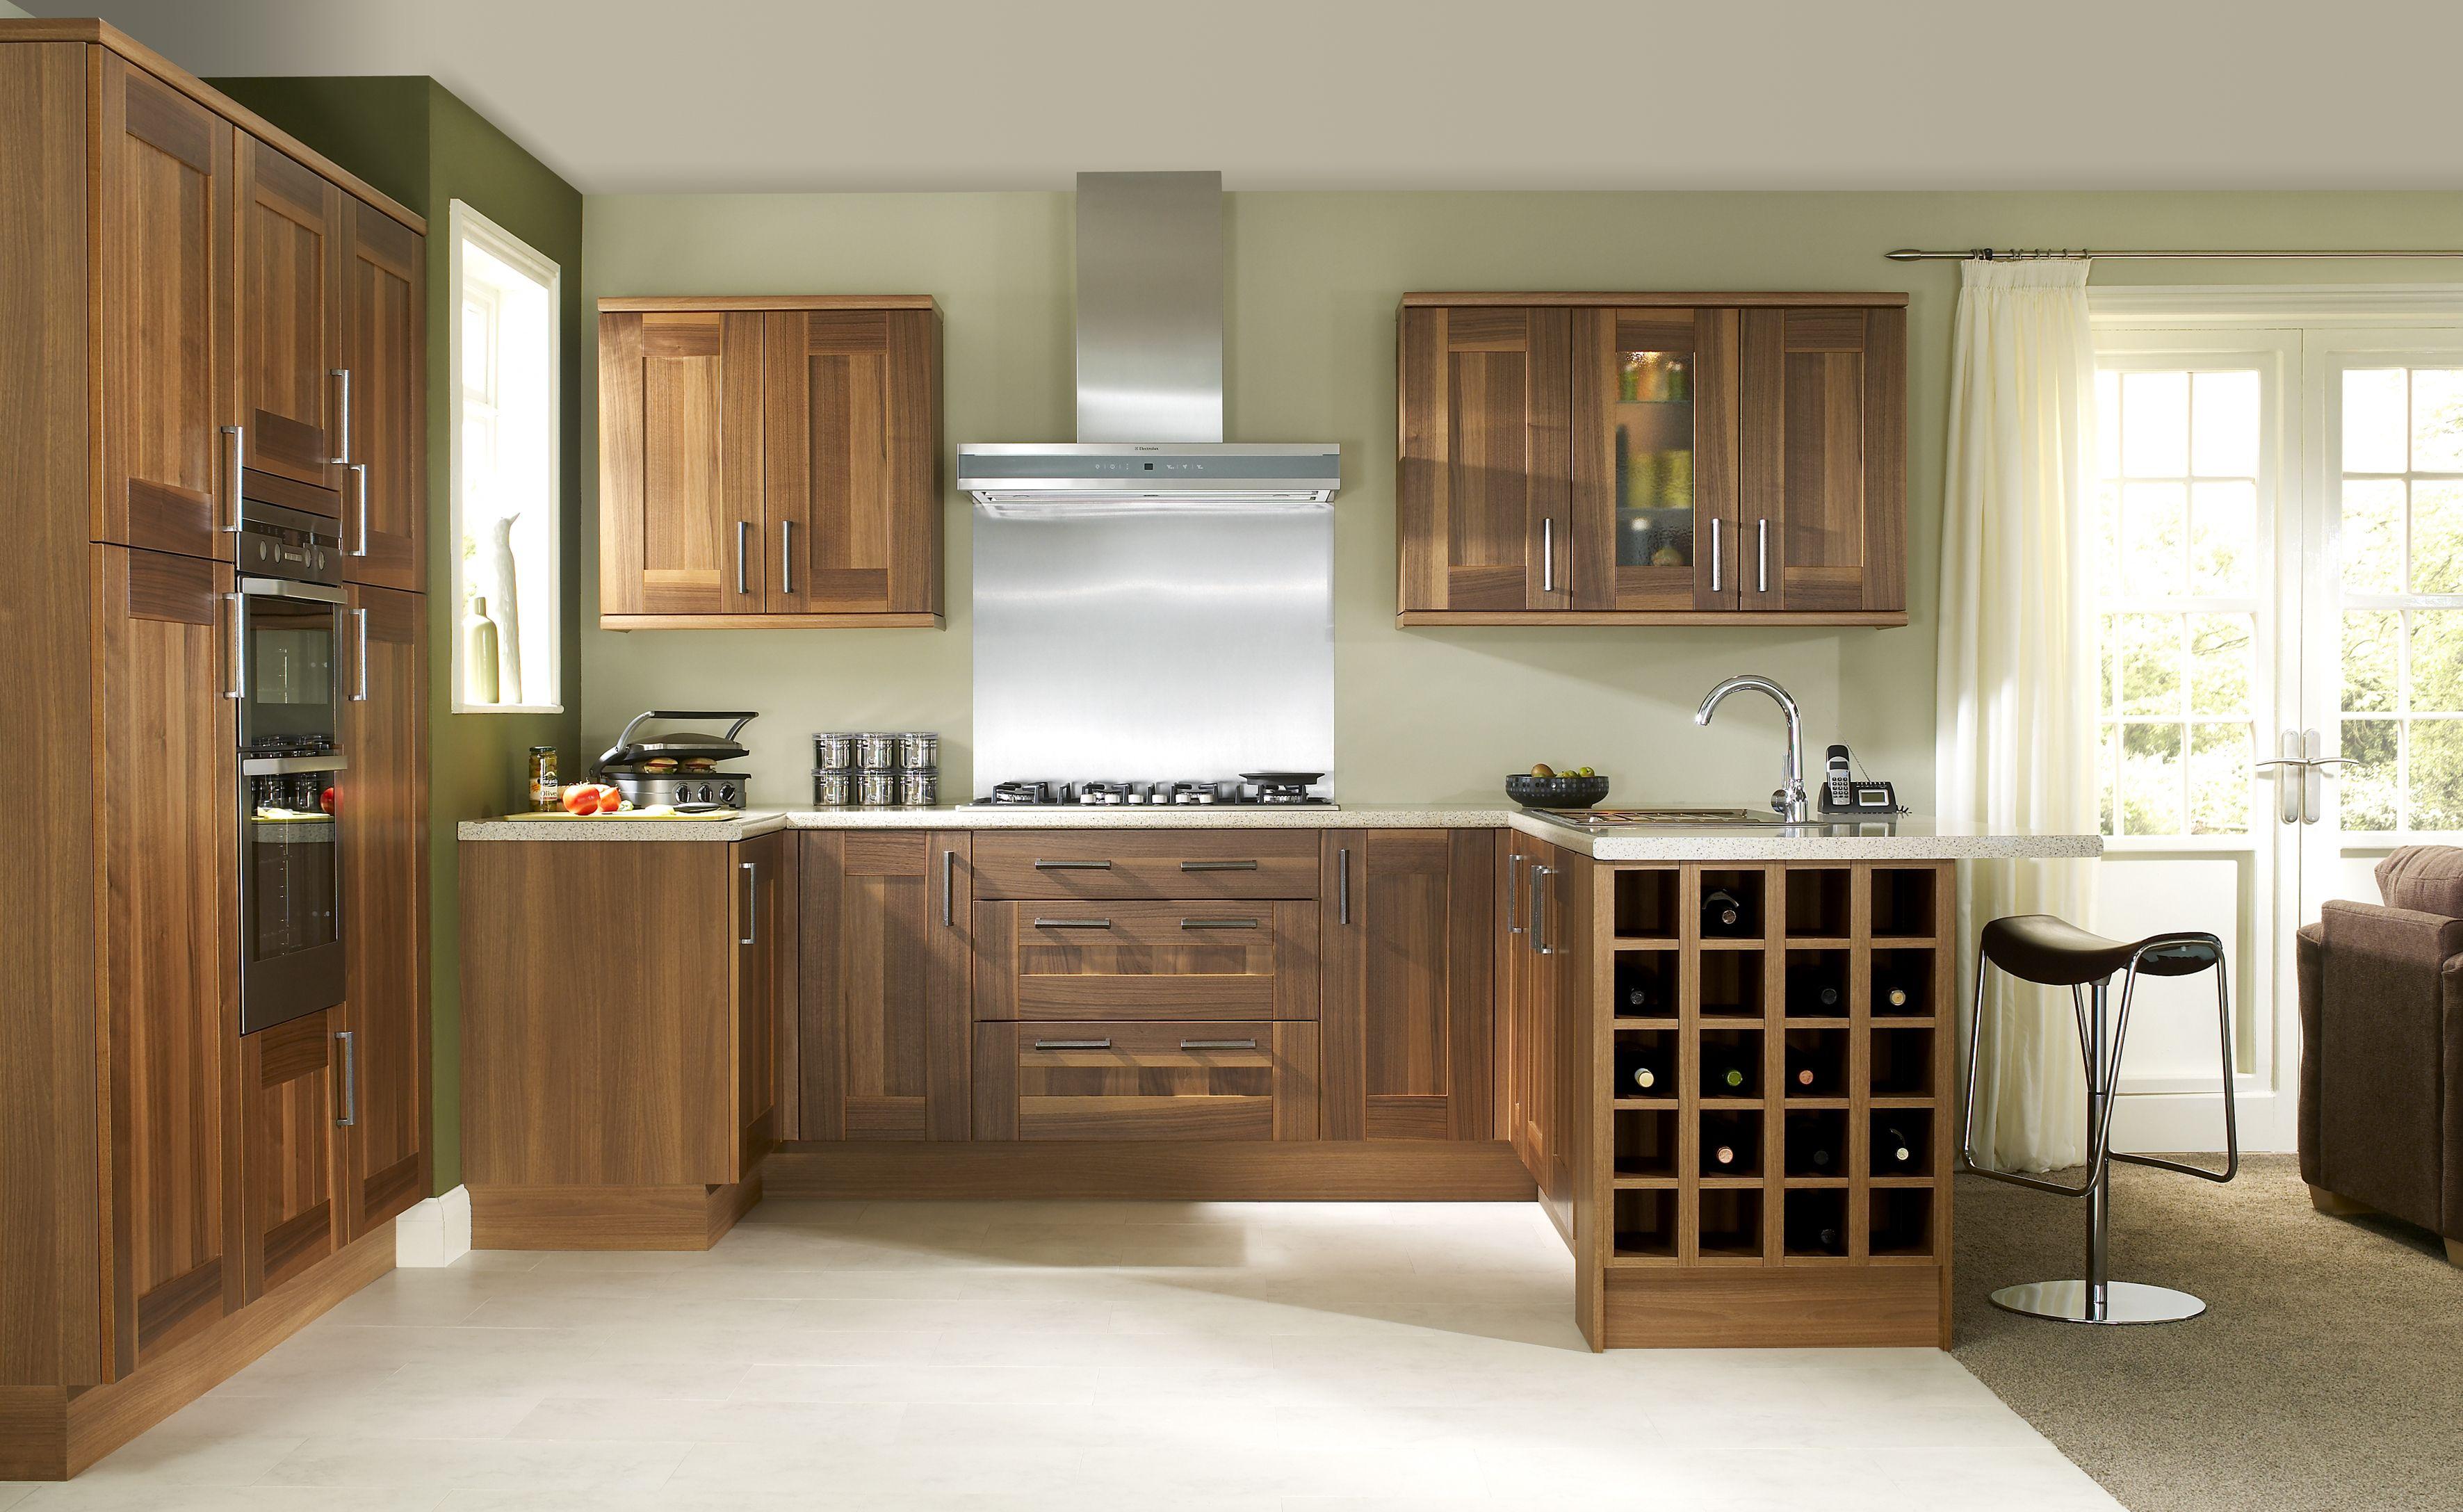 Pin By Gea Gurun On Walnut Kitchen Ideas Symphony Kitchen Small Kitchen Makeovers Kitchen Units